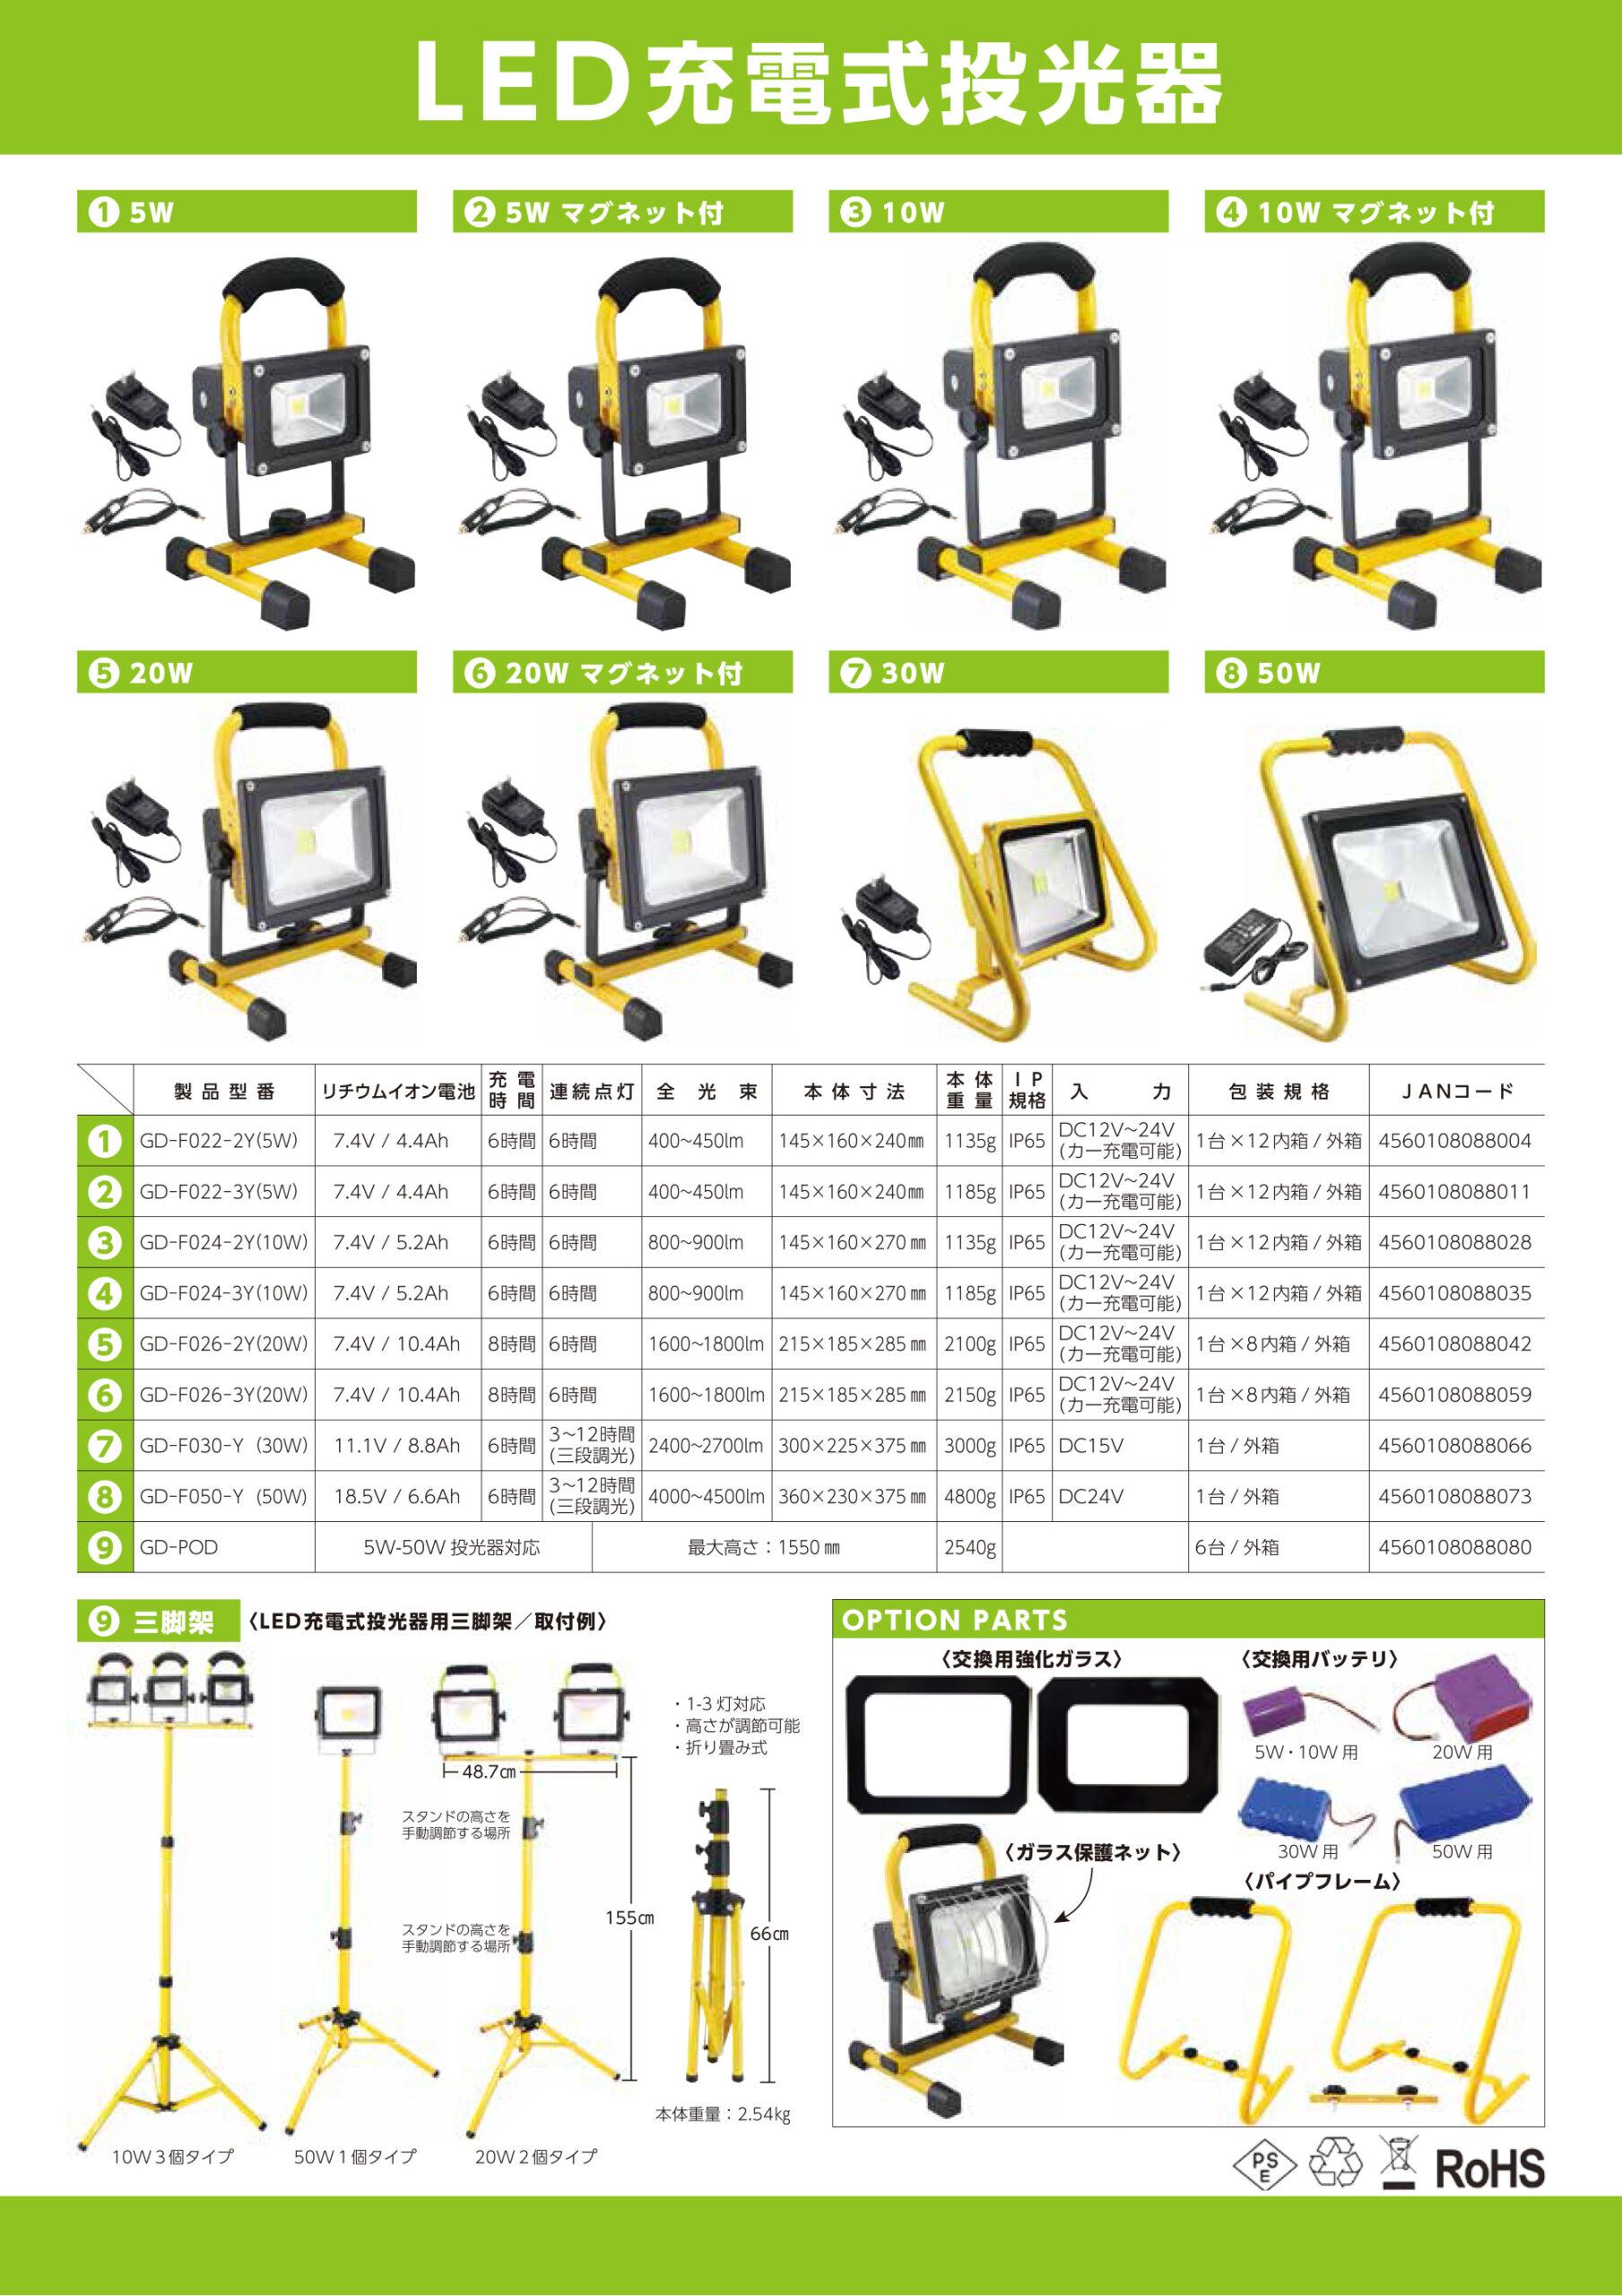 LED 充電式投光器-------¥ 製品型番リチウムイオン電池充電運続点灯全光束本体寸法本体I p時間 重量 規格 入 力 包装規格 」 AN コード c GD-F022-2Y(5W) 7 4V / 44Ah 6 時間6 時間400~450lm 145X160X240mm 1135g IP65DC12V-24V1 台X12 内箱/外箱4560108088004(カー充電可能)② GD-F022-3Y(5W) 7 4V / 44Ah 6 時間6 時間400~450lm 145X160X240mm 1185g IP65DC12V-24V1 台X12 内箱/外箱4560108088011(カー充竃可能)③ GD-F024-2Y(1 OW) 7.4V / 5.2Ah 6 時間6 時間800~900lm 145X160X270mm 1135g IP65DC12V-24V1 台X12 内箱/外箱4560108088028(カー充電可能)④ GD-F024-3Y (1 OW) 7 4V / 5 2Ah 6 時間6 時間800~900lm 145X160X270mm 1185g IP65DC12V-24V1 台X12 内箱/外箱4560108088035(カー充電可能)⑤ GD-F026-2Y(20W) 7.4V / 10.4Ah 8 時間6 時間1600~1 BOOlm 215X185X285 闘2100g IP65DC12V-24V1 台X8 内箱/外箱4560108088042(カー充電可能)⑥ GD-F026-3Y(20W) 7.4V / 10.4Ah 8 時間6 時間1600~1800lm 215X185X285mm 2150g IP65DC12V-24V1 台X8 内箱/外箱4560108088059(カー充電可能)⑦ GD-F030-Y (30W) 11 1V / 88Ah 6 時間3~12 時閻2400~2700lm 300 x 225 x 375 mm 3000g IP65 DC15V 1 台/外箱4560108088066(三段調光)⑥ GD-FOSO-Y (SOW) 18 5V / 66Ah 6 時間3~12 時閻4000~4500lm 360X230X375 mm 4800g IP65 DC24V 1 台/外箱4560108088073(三段調光)⑨ GD-POD 5W-50W 投光器対応最大高さ1550 圃2540g 6 台/外箱4560108088080[9三I]-冒〈LED 充電式設光器用三脚顔/取付例〉